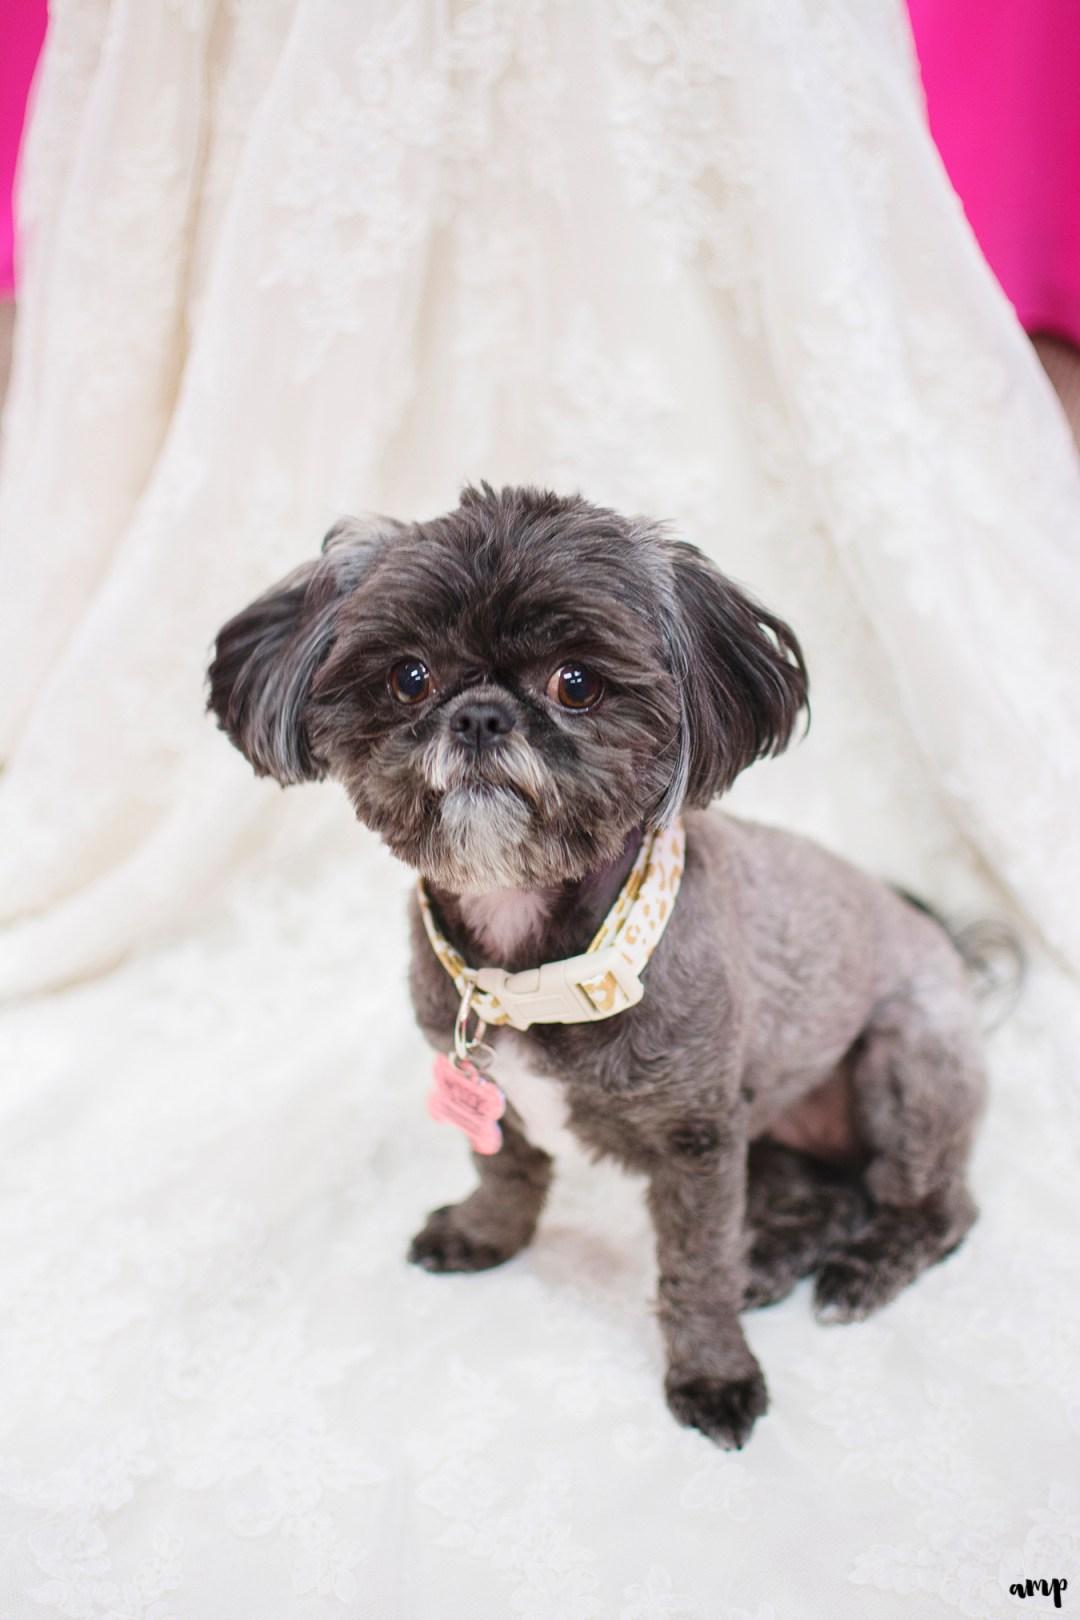 Bride & groom's puppy on wedding dress